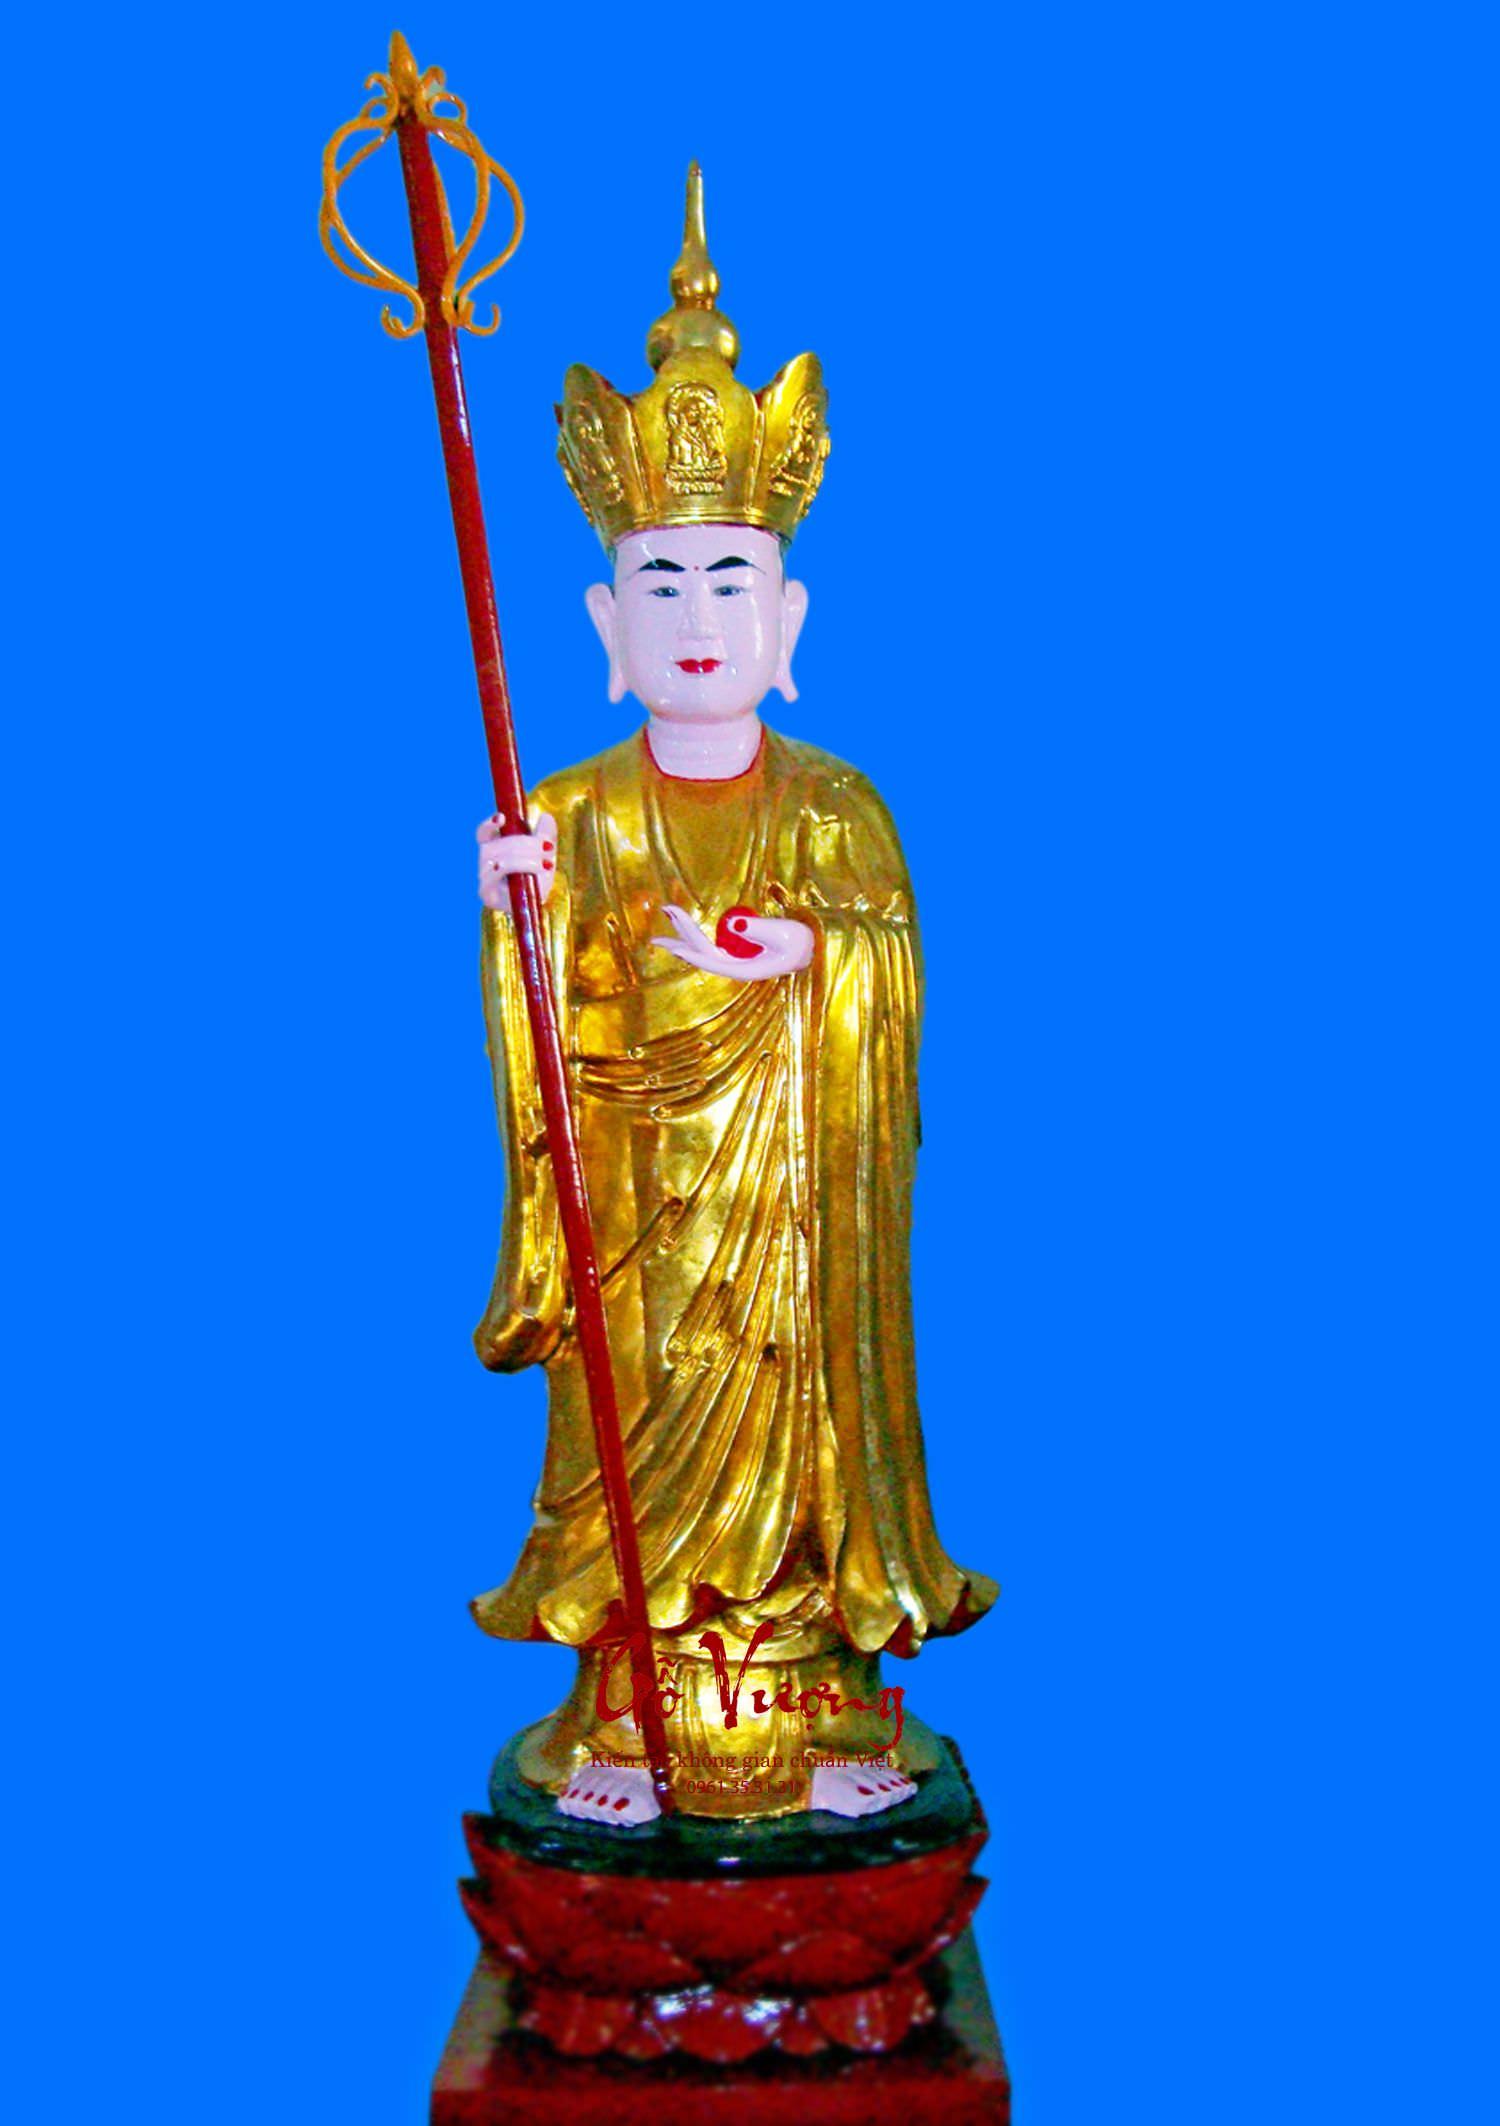 Nhung Loi Ich Khi Tho Tuong Dia Tang Vuong Bo Tat